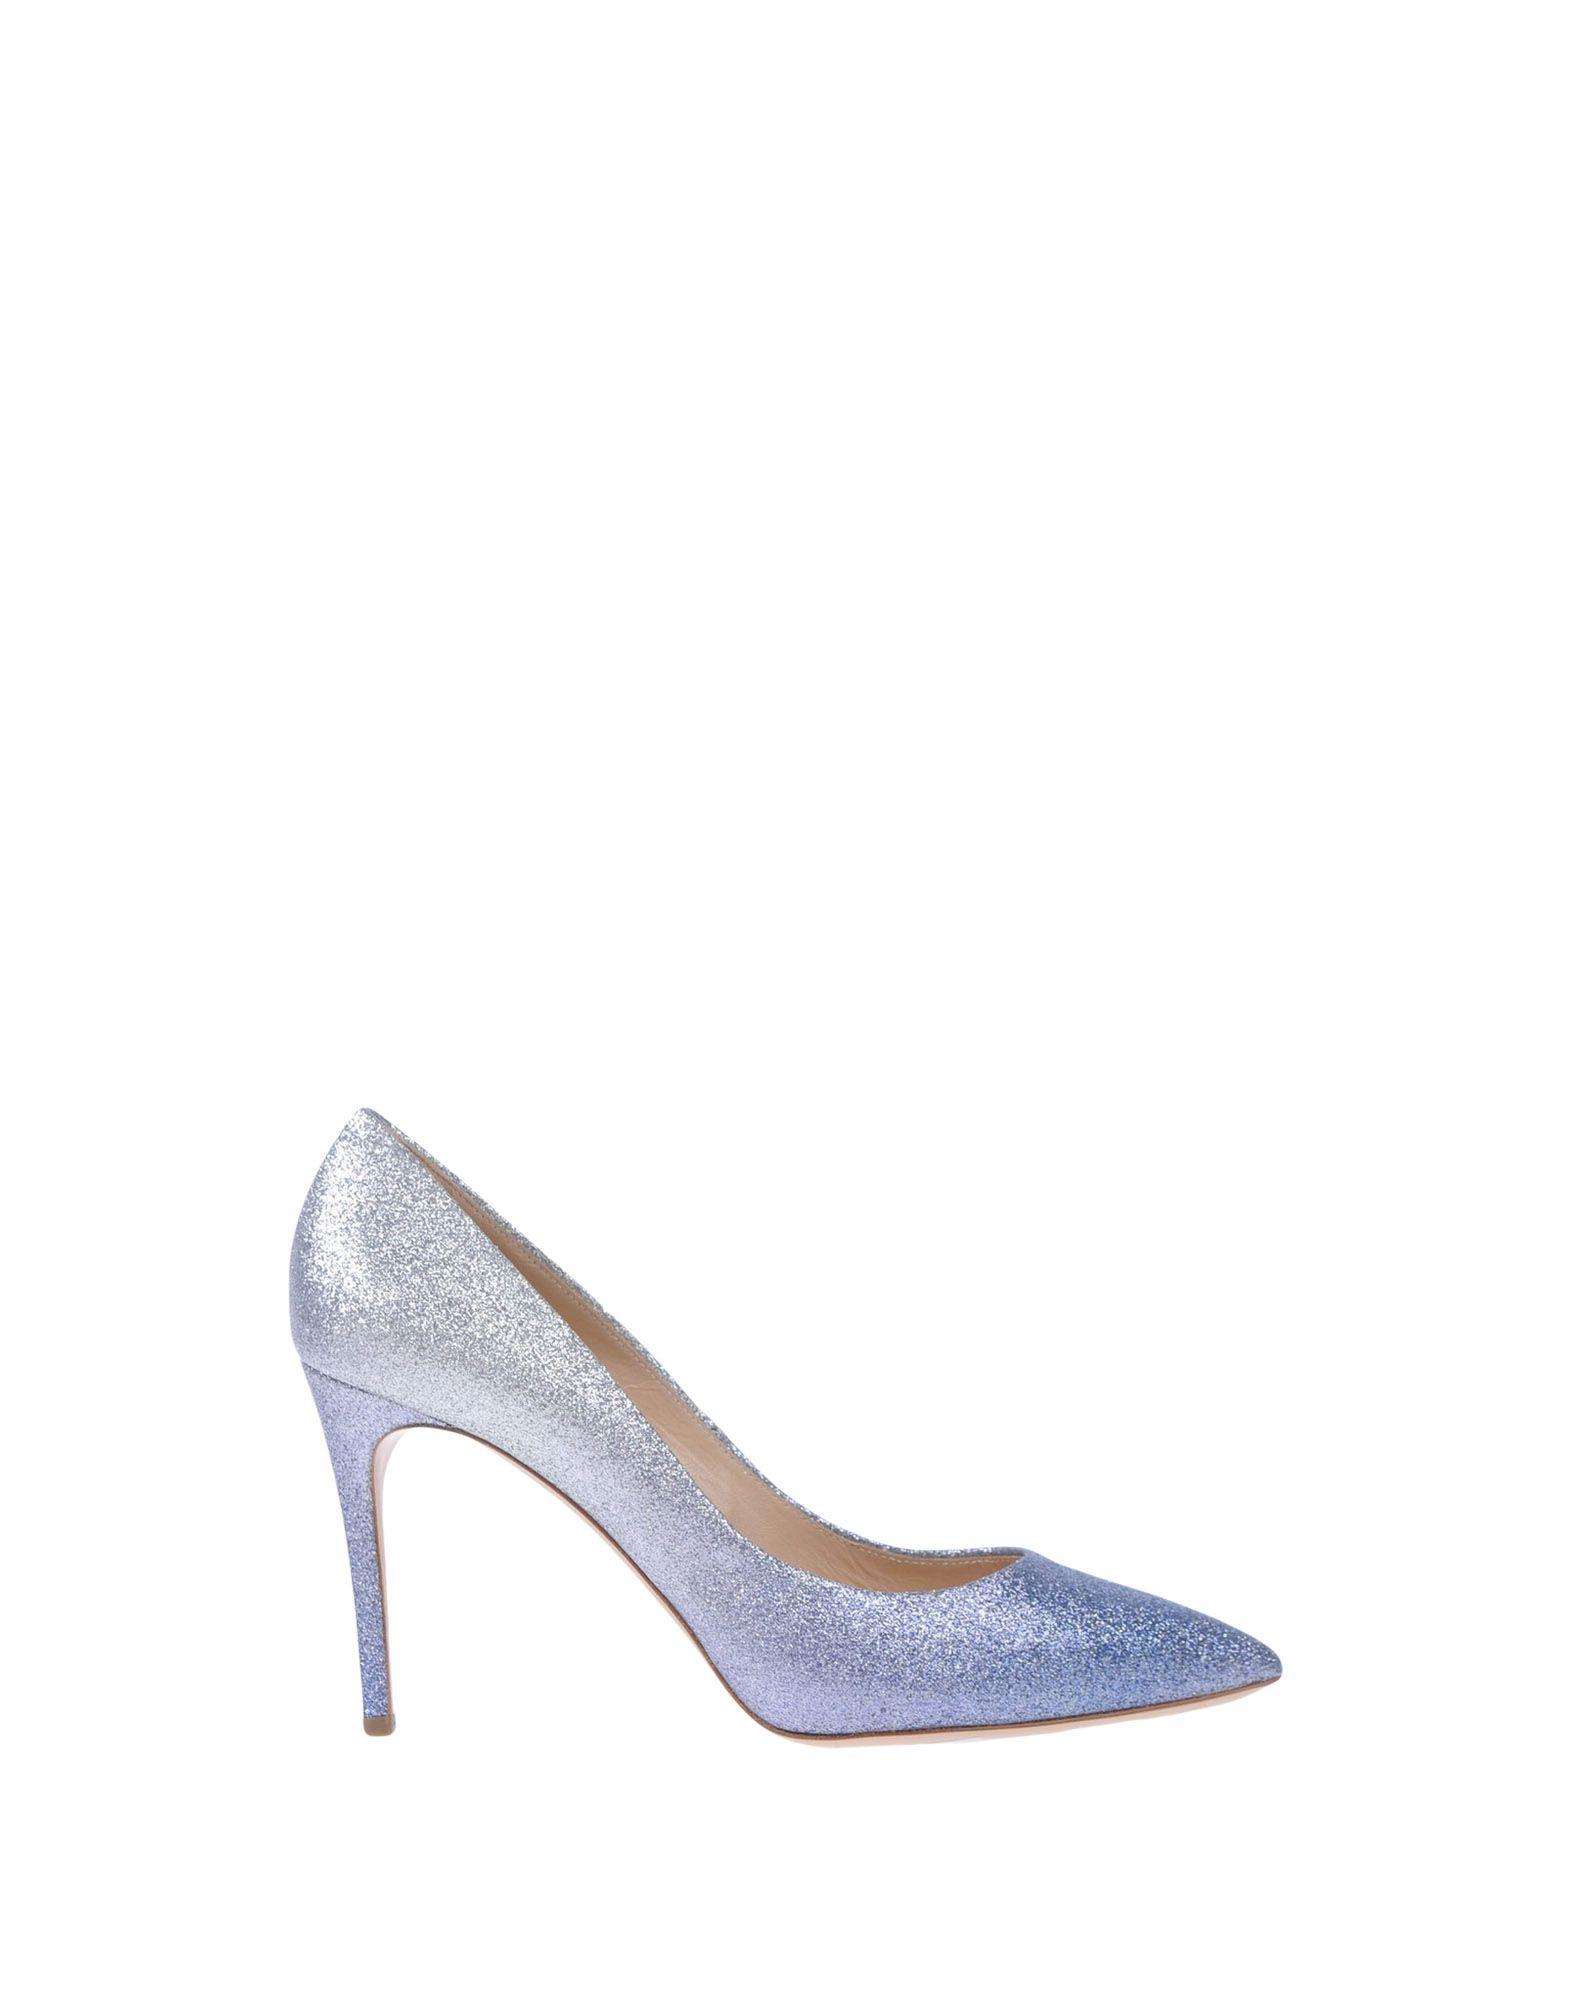 Casadei Pumps Damen  11126426JVGut aussehende strapazierfähige Schuhe